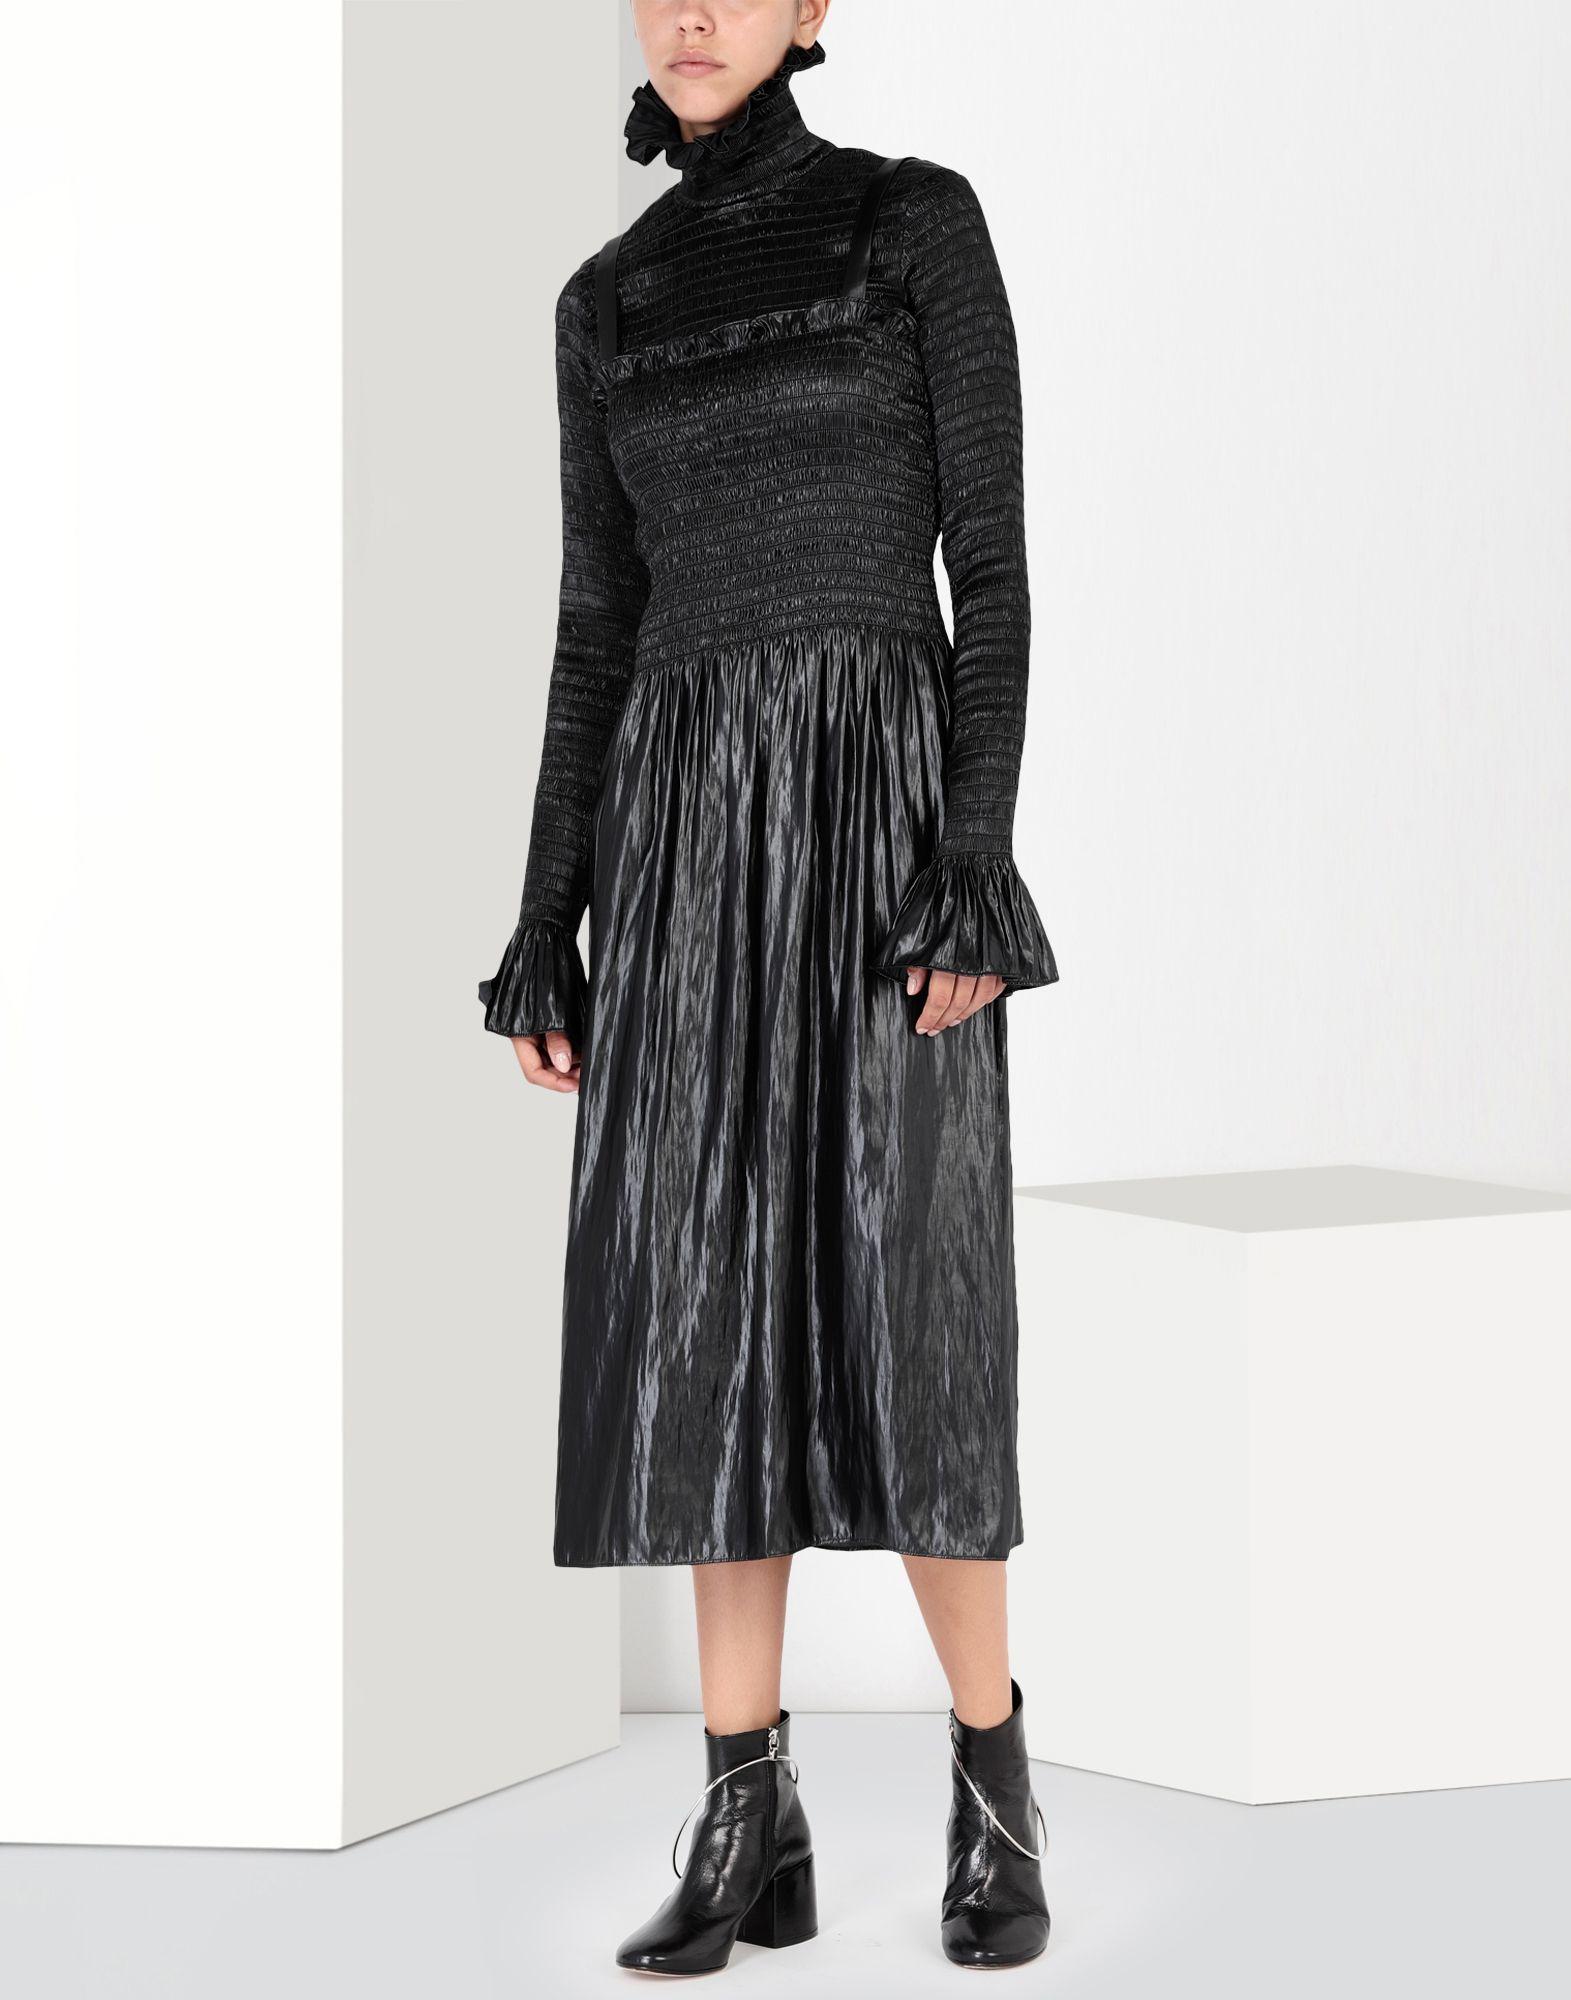 MM6 MAISON MARGIELA Fluid satin dress 3/4 length dress Woman r